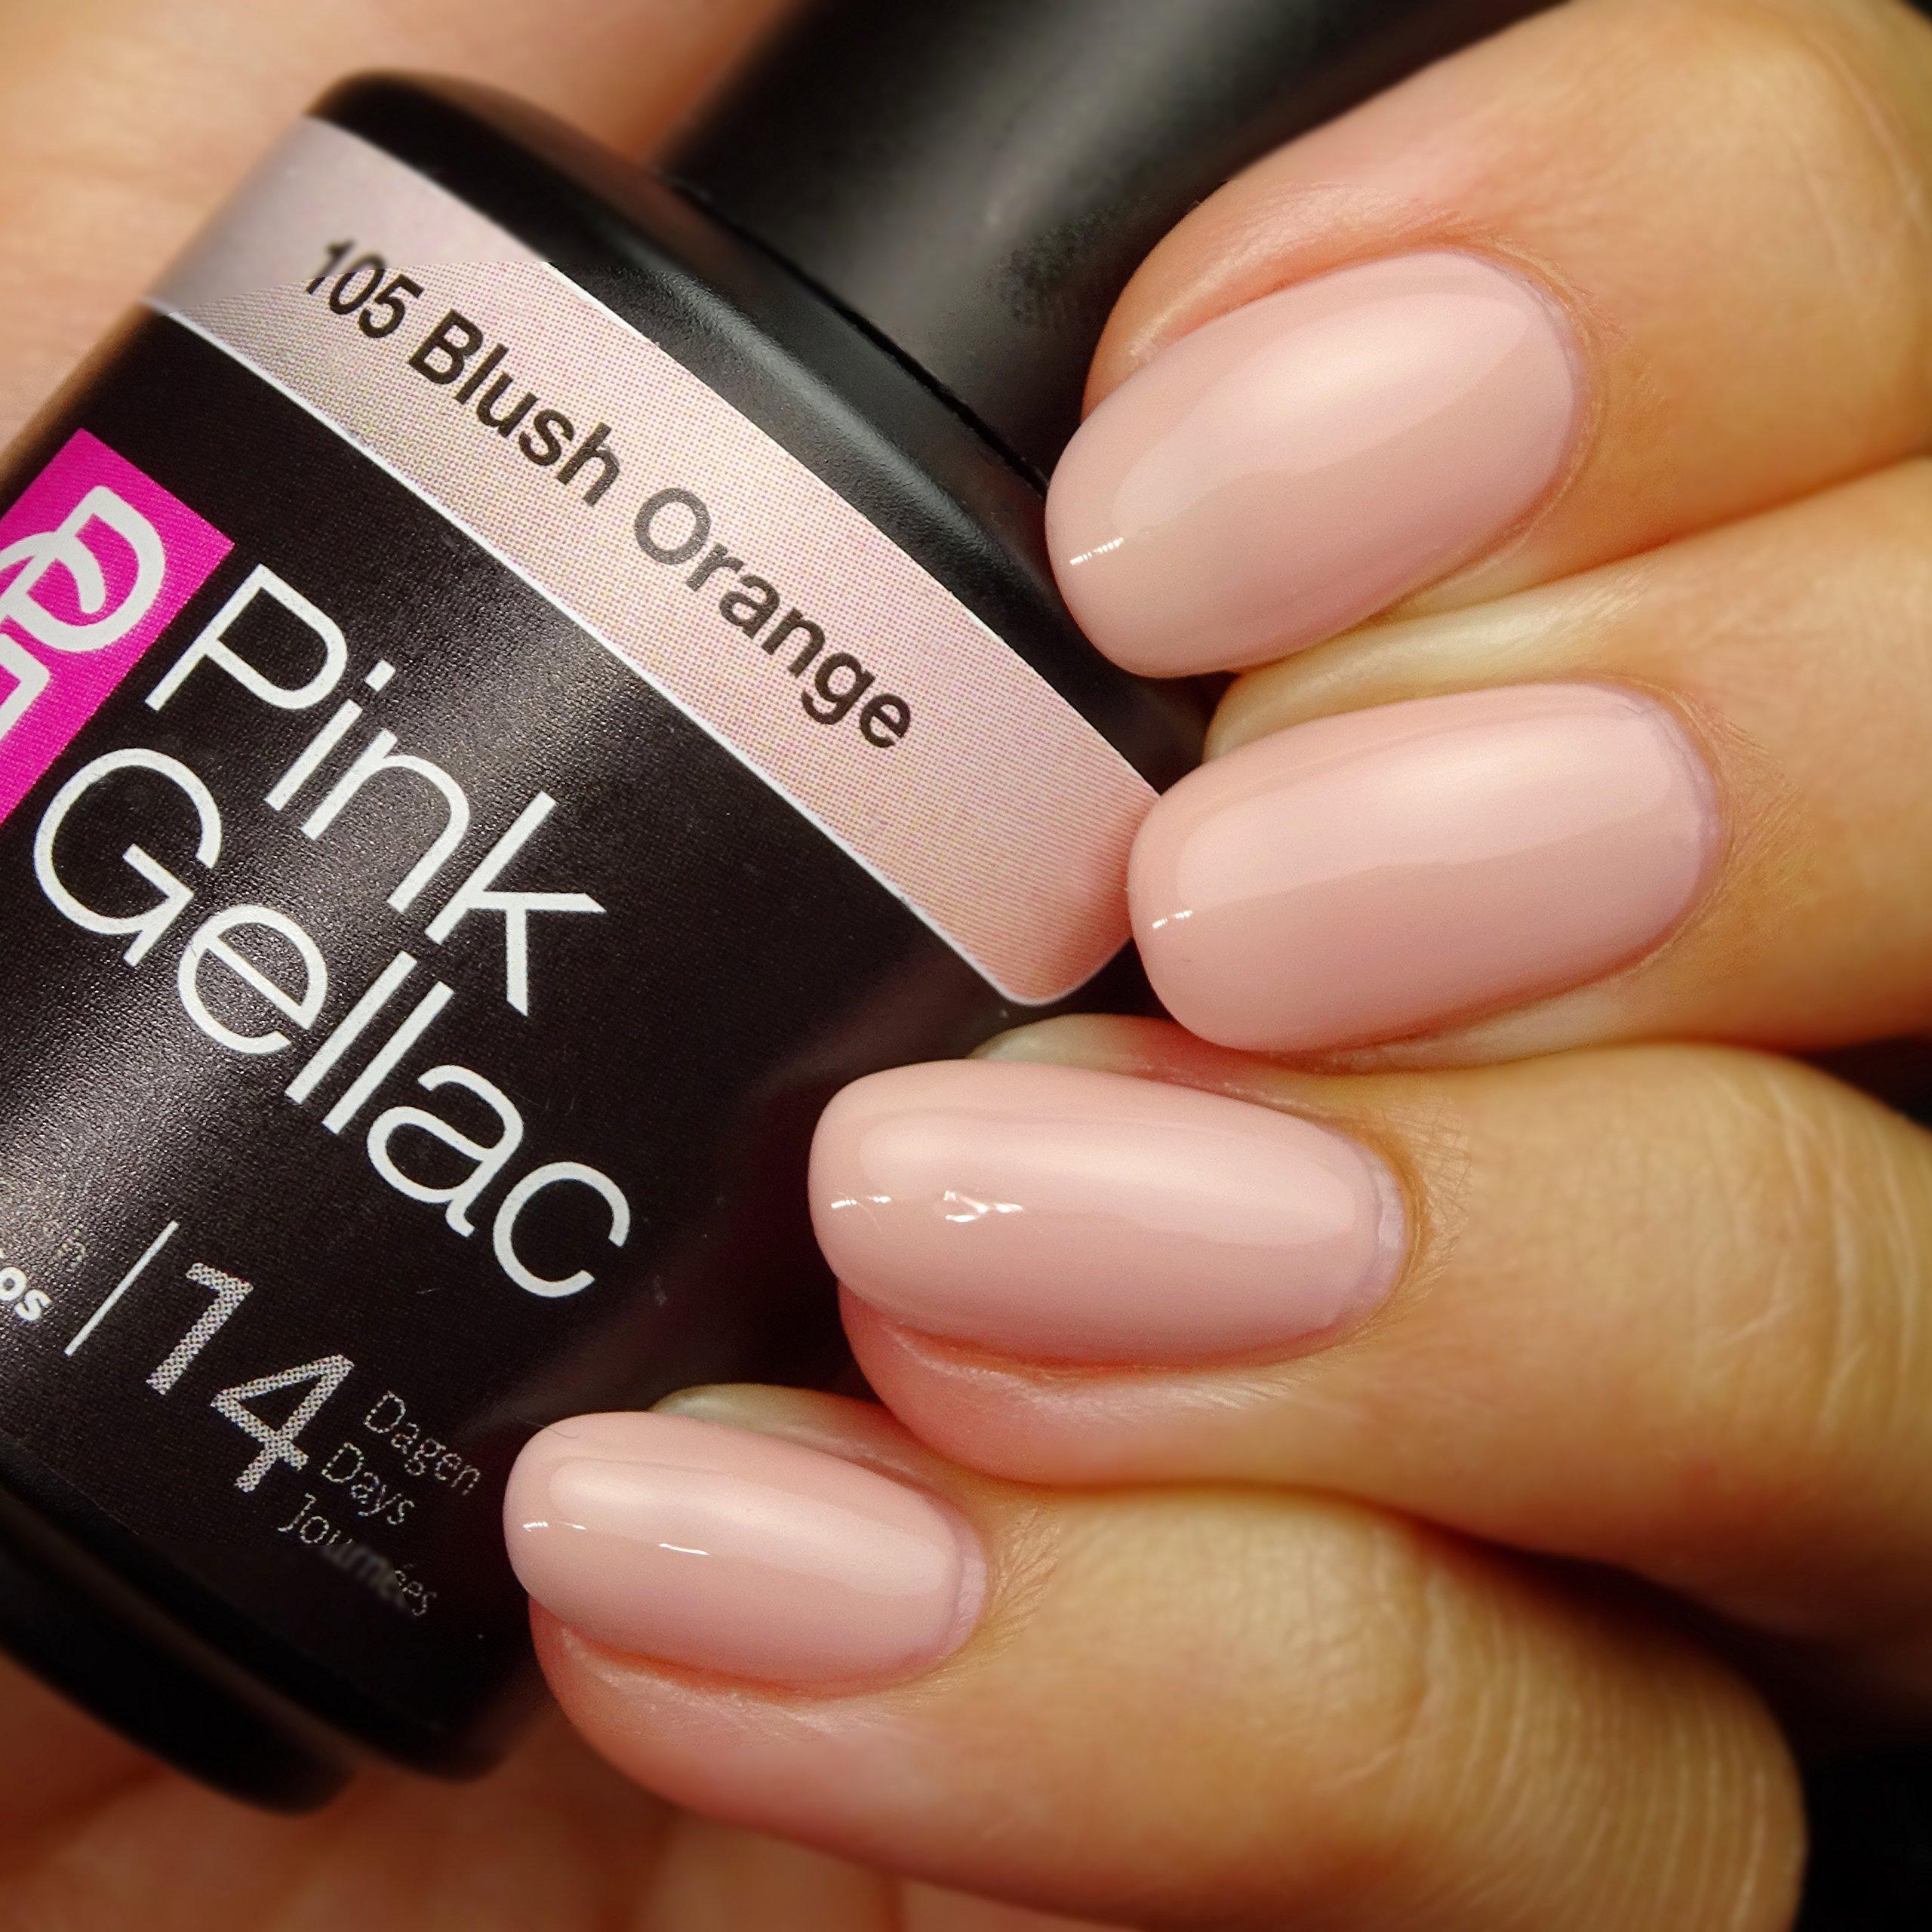 Pink Gellac #105 Blush Orange Soak-Off UV / LED Gel Polish (15ml